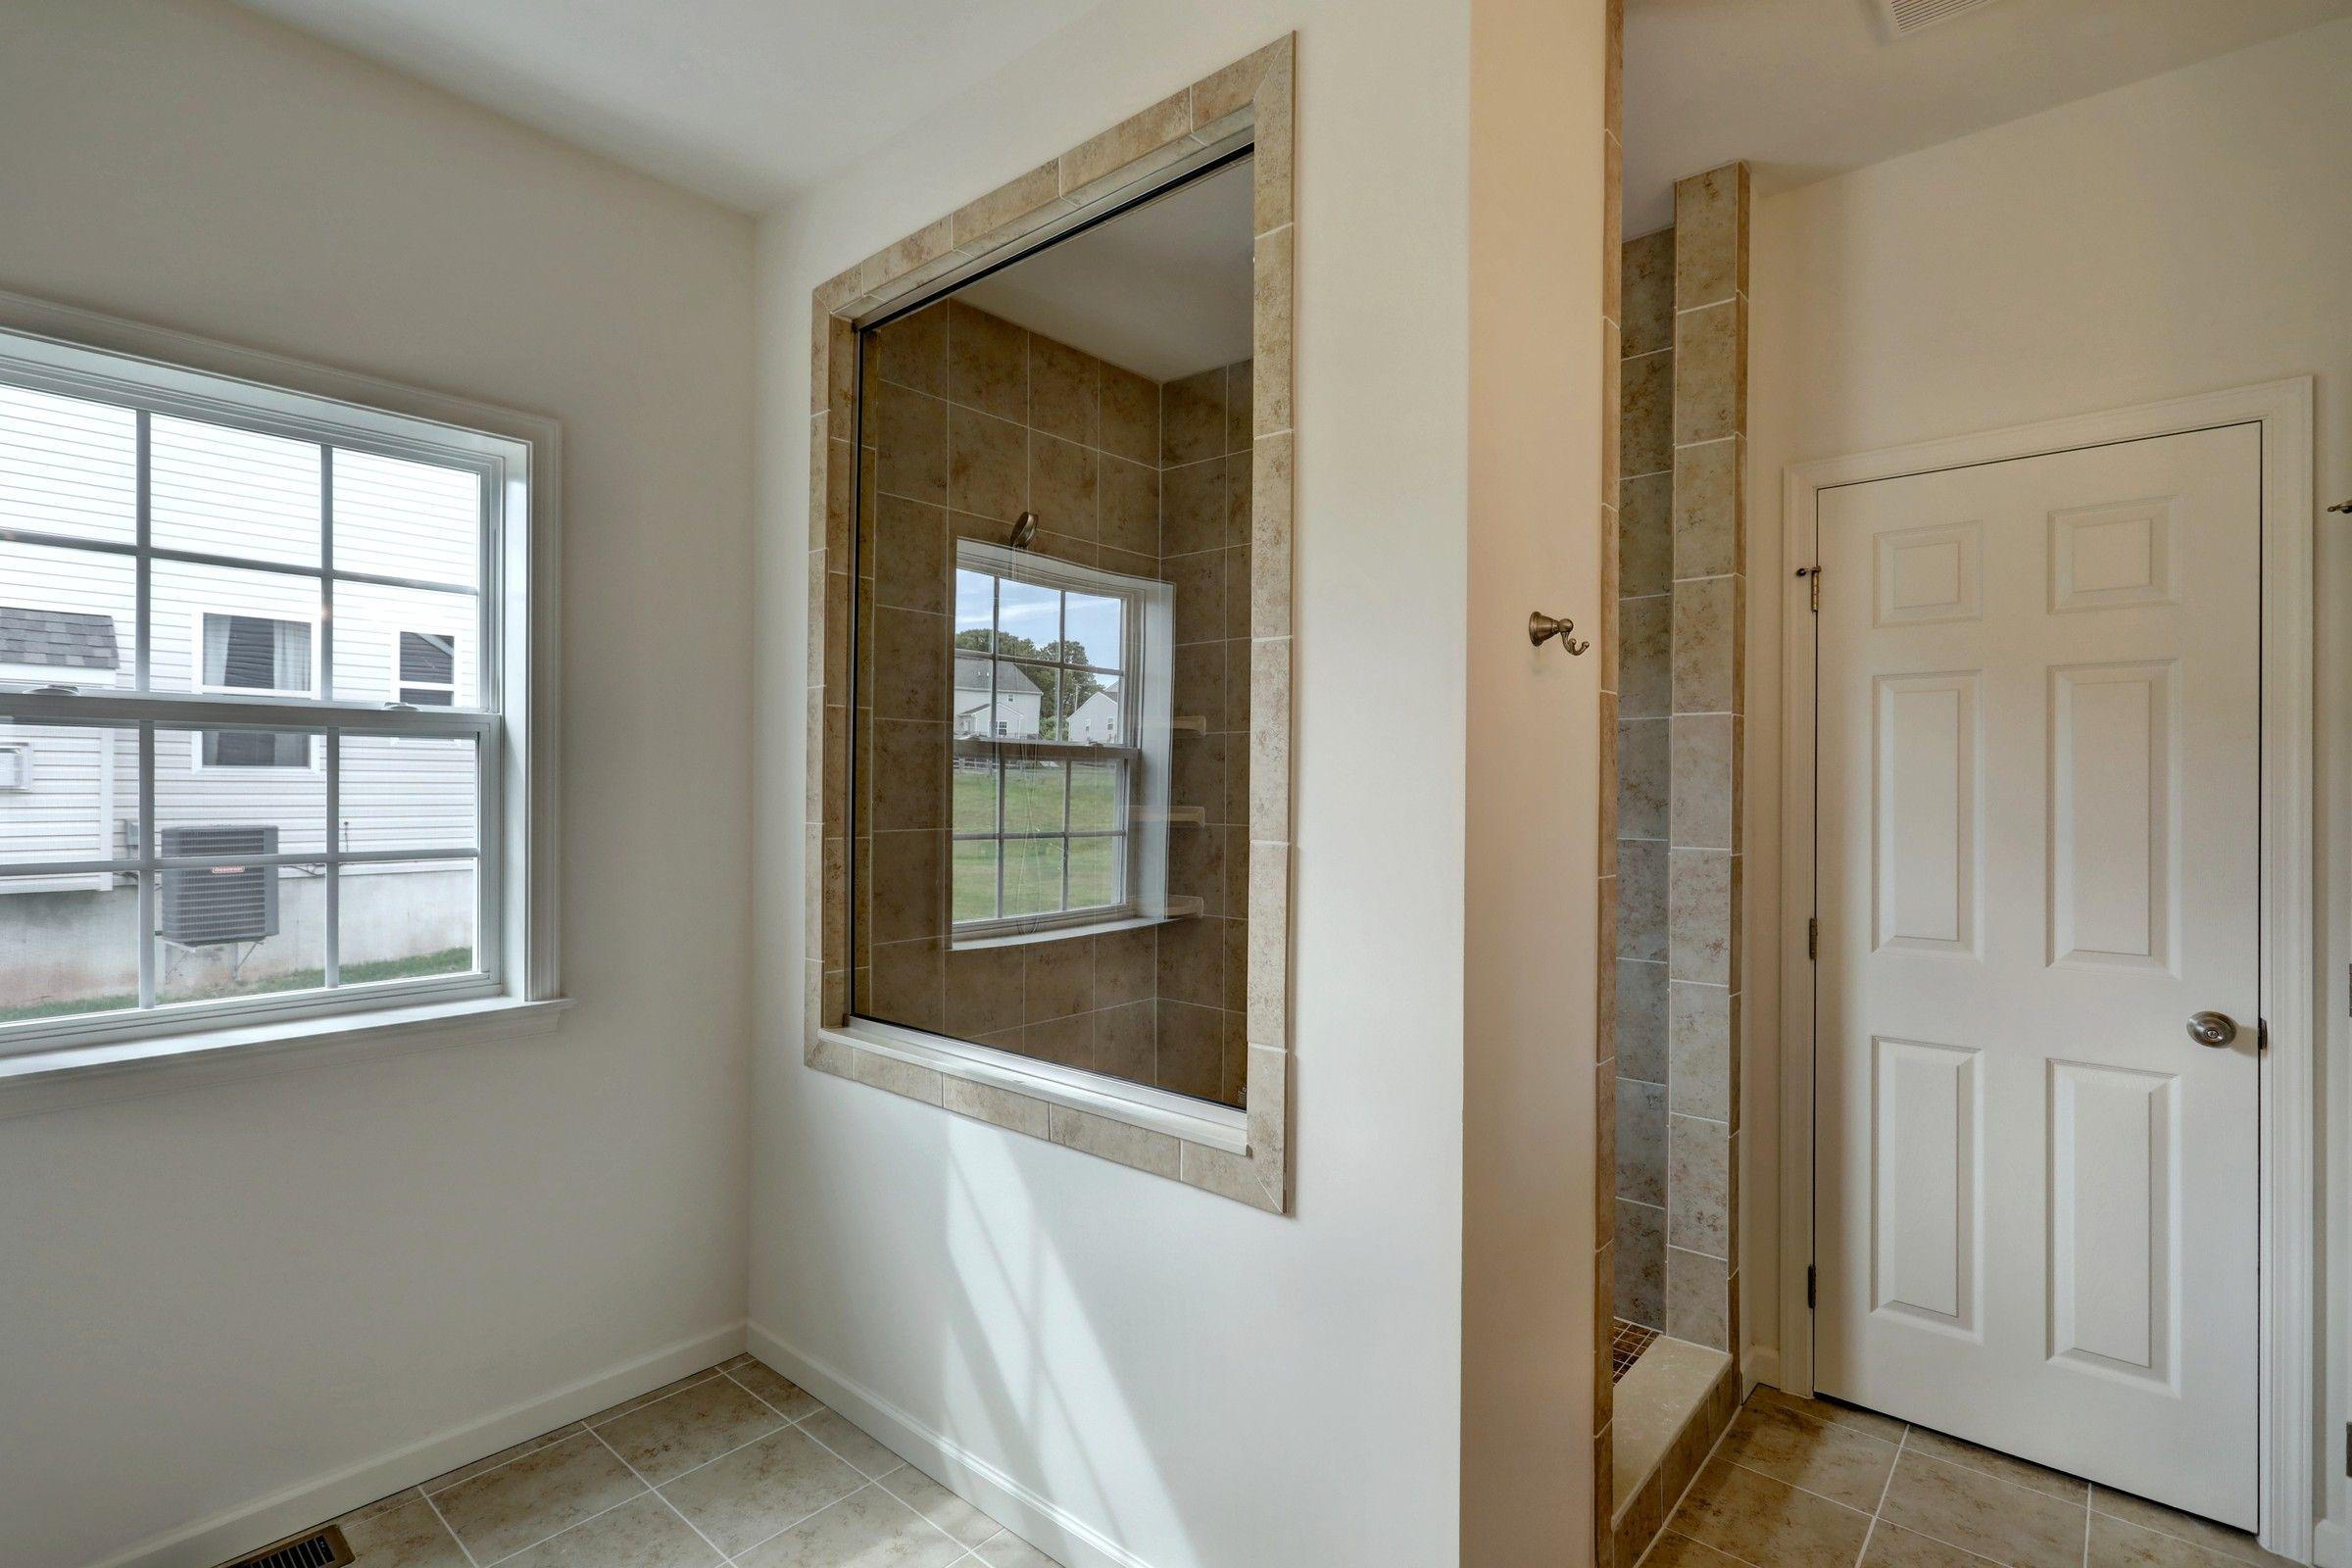 Bathroom featured in the Arcadia Normandy By Keystone Custom Homes in Wilmington-Newark, MD